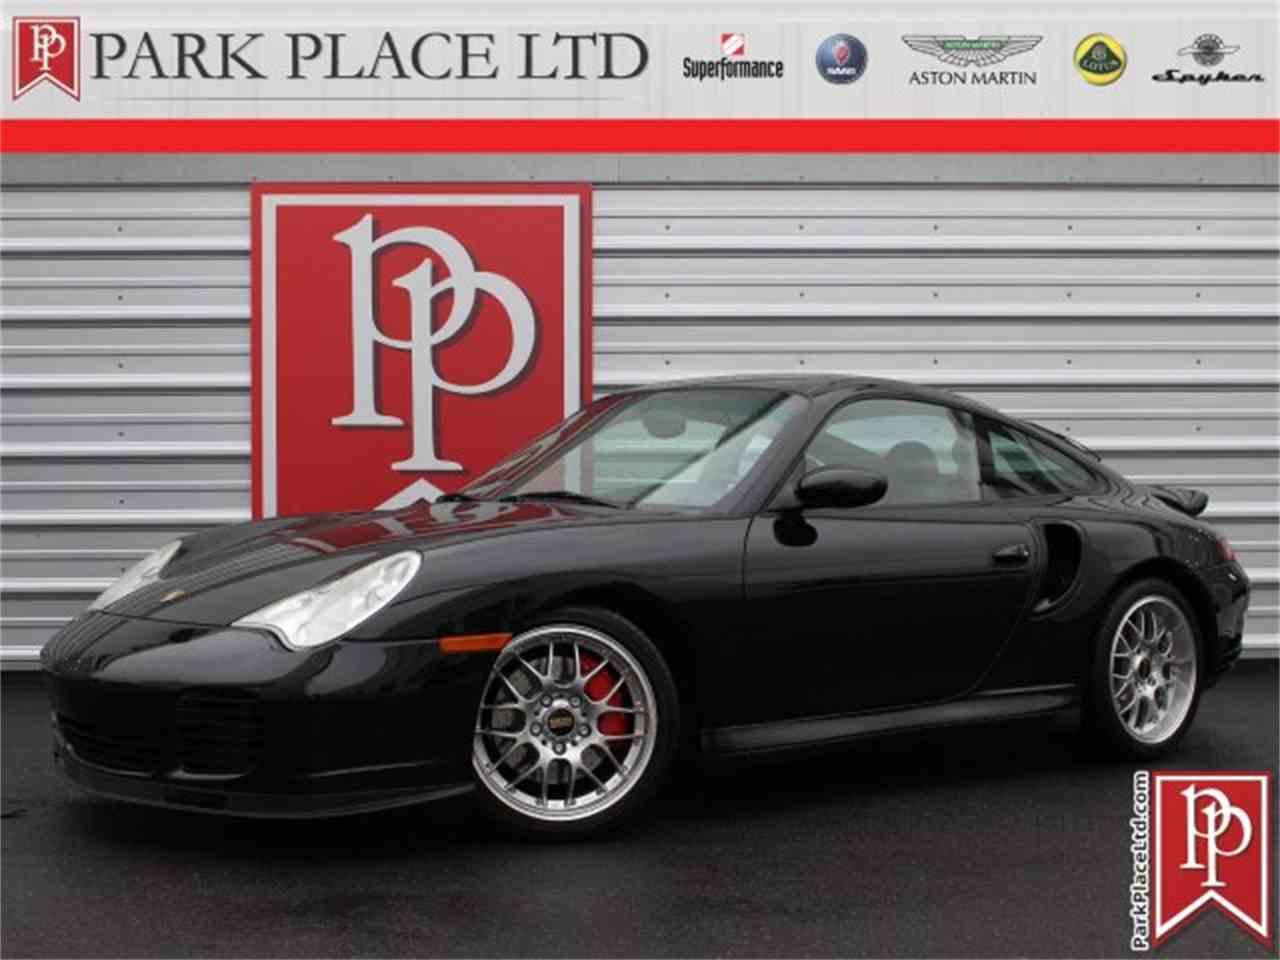 All Types 2003 911 : 2003 Porsche 911 Turbo for Sale | ClassicCars.com | CC-1035590